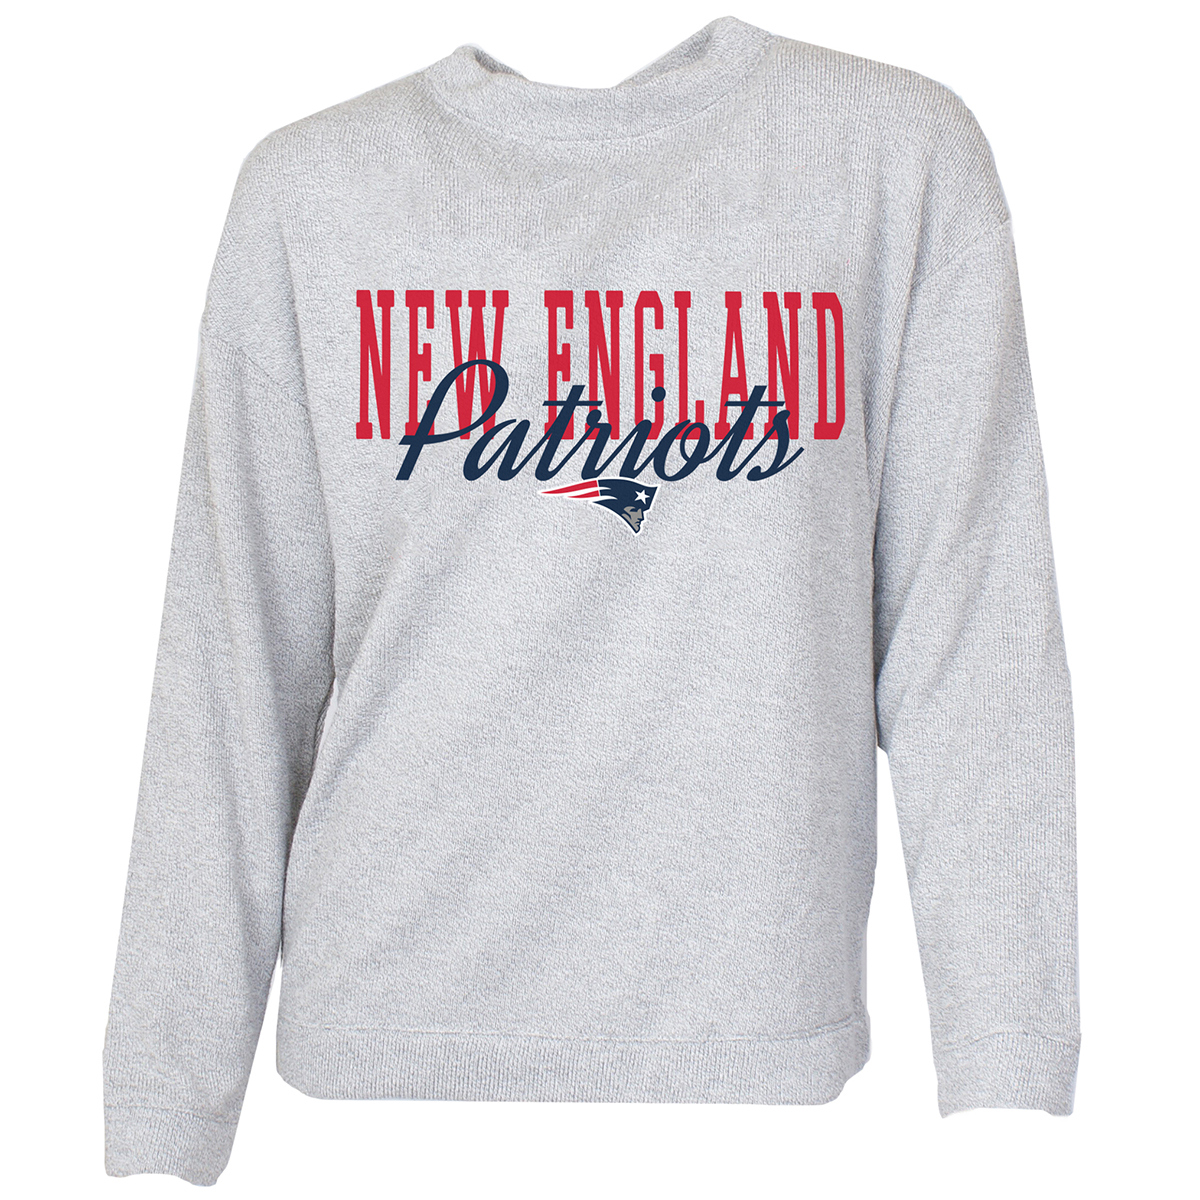 new england patriots women's long sleeve shirts